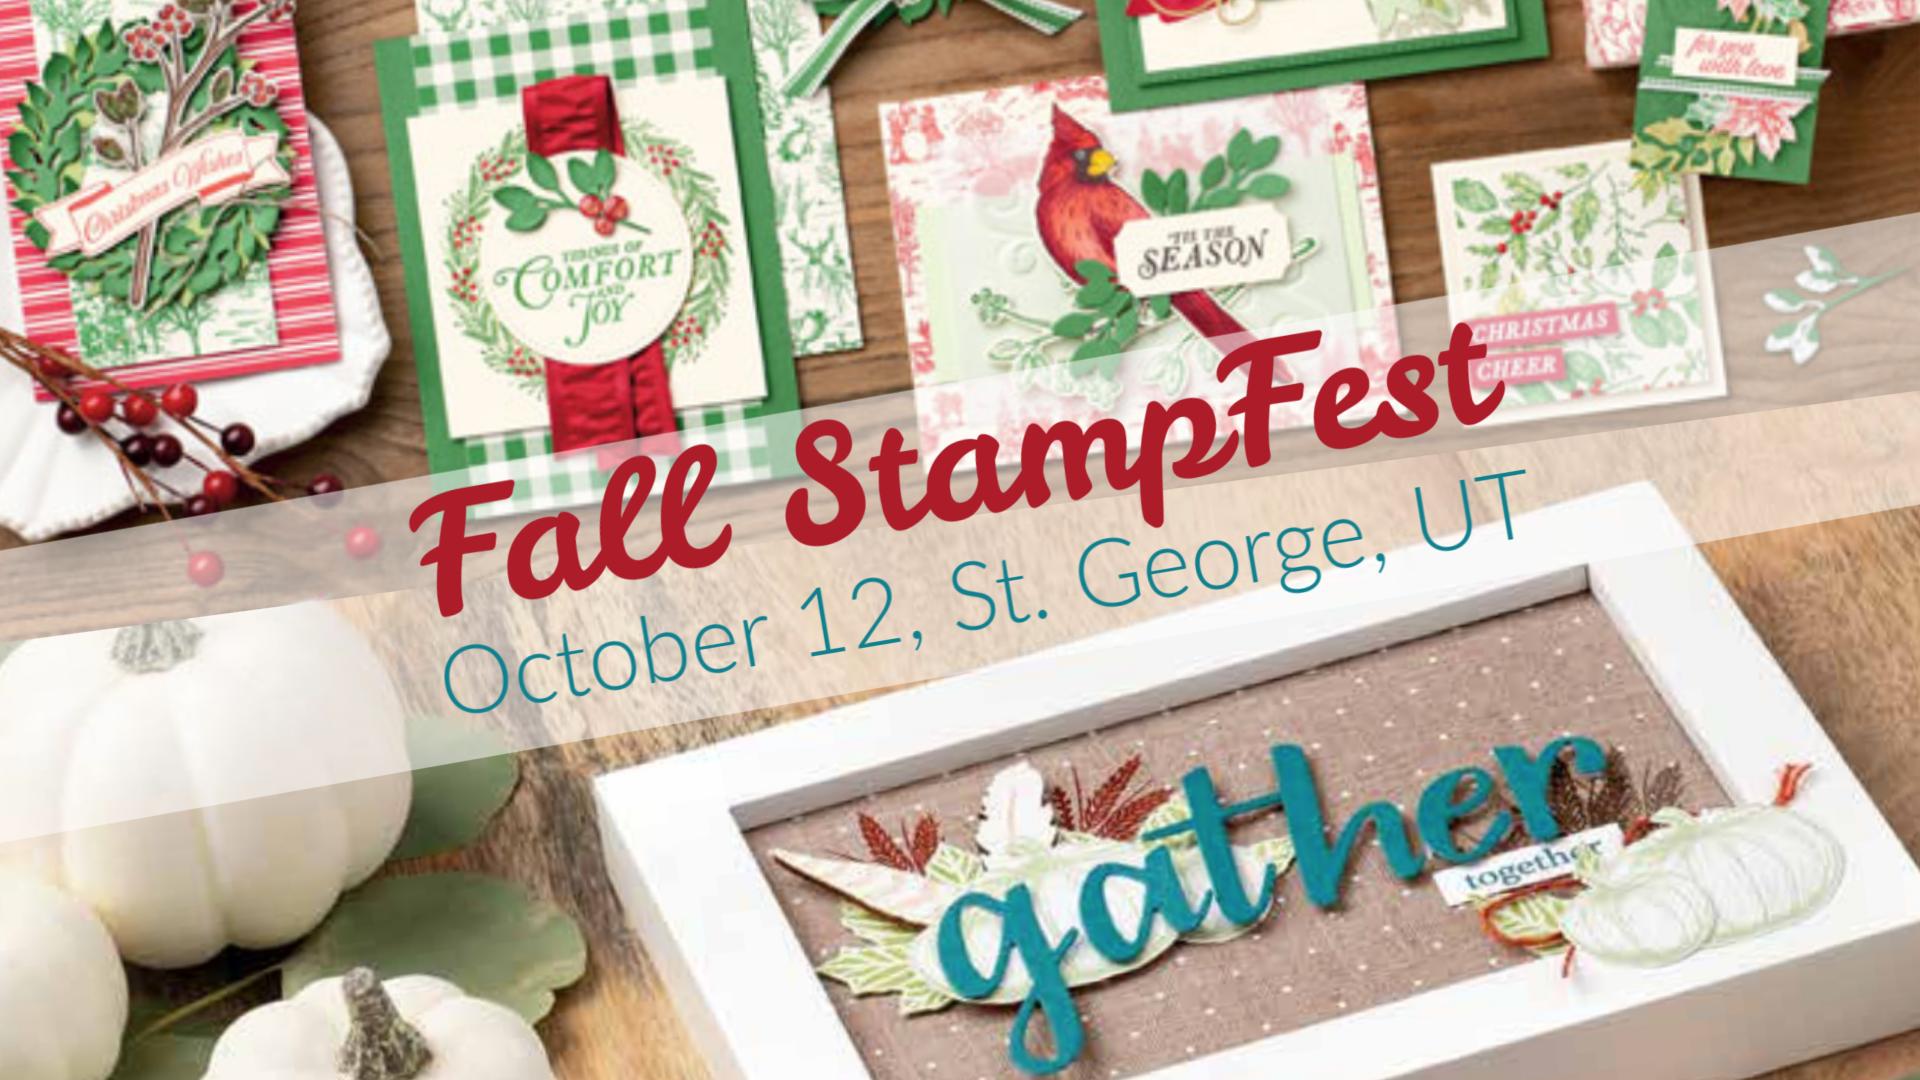 Fall StampFest SGU